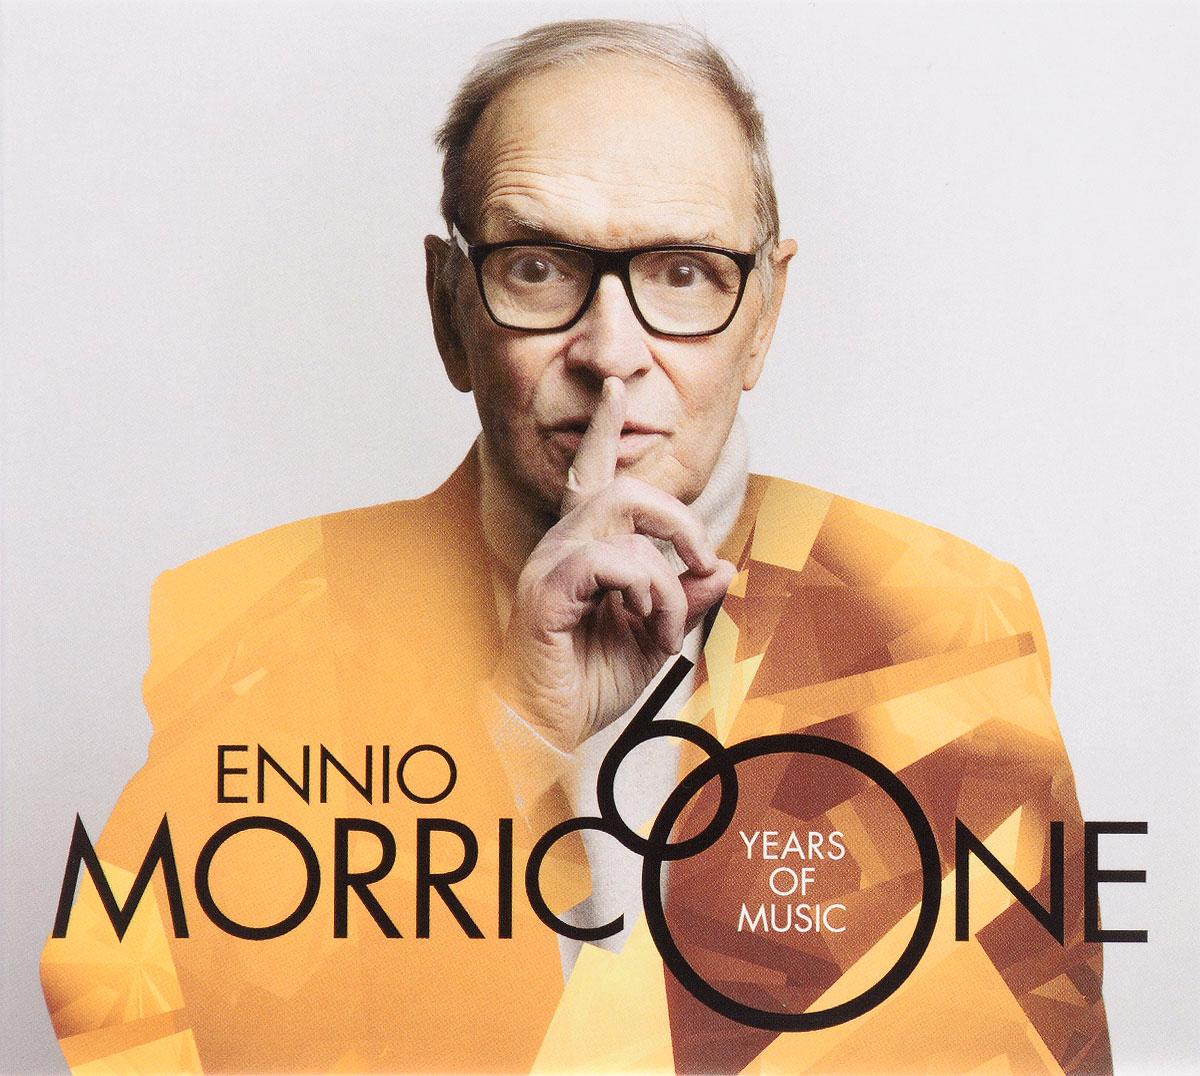 Ennio Morricone. Morricone 60 Years Of Music